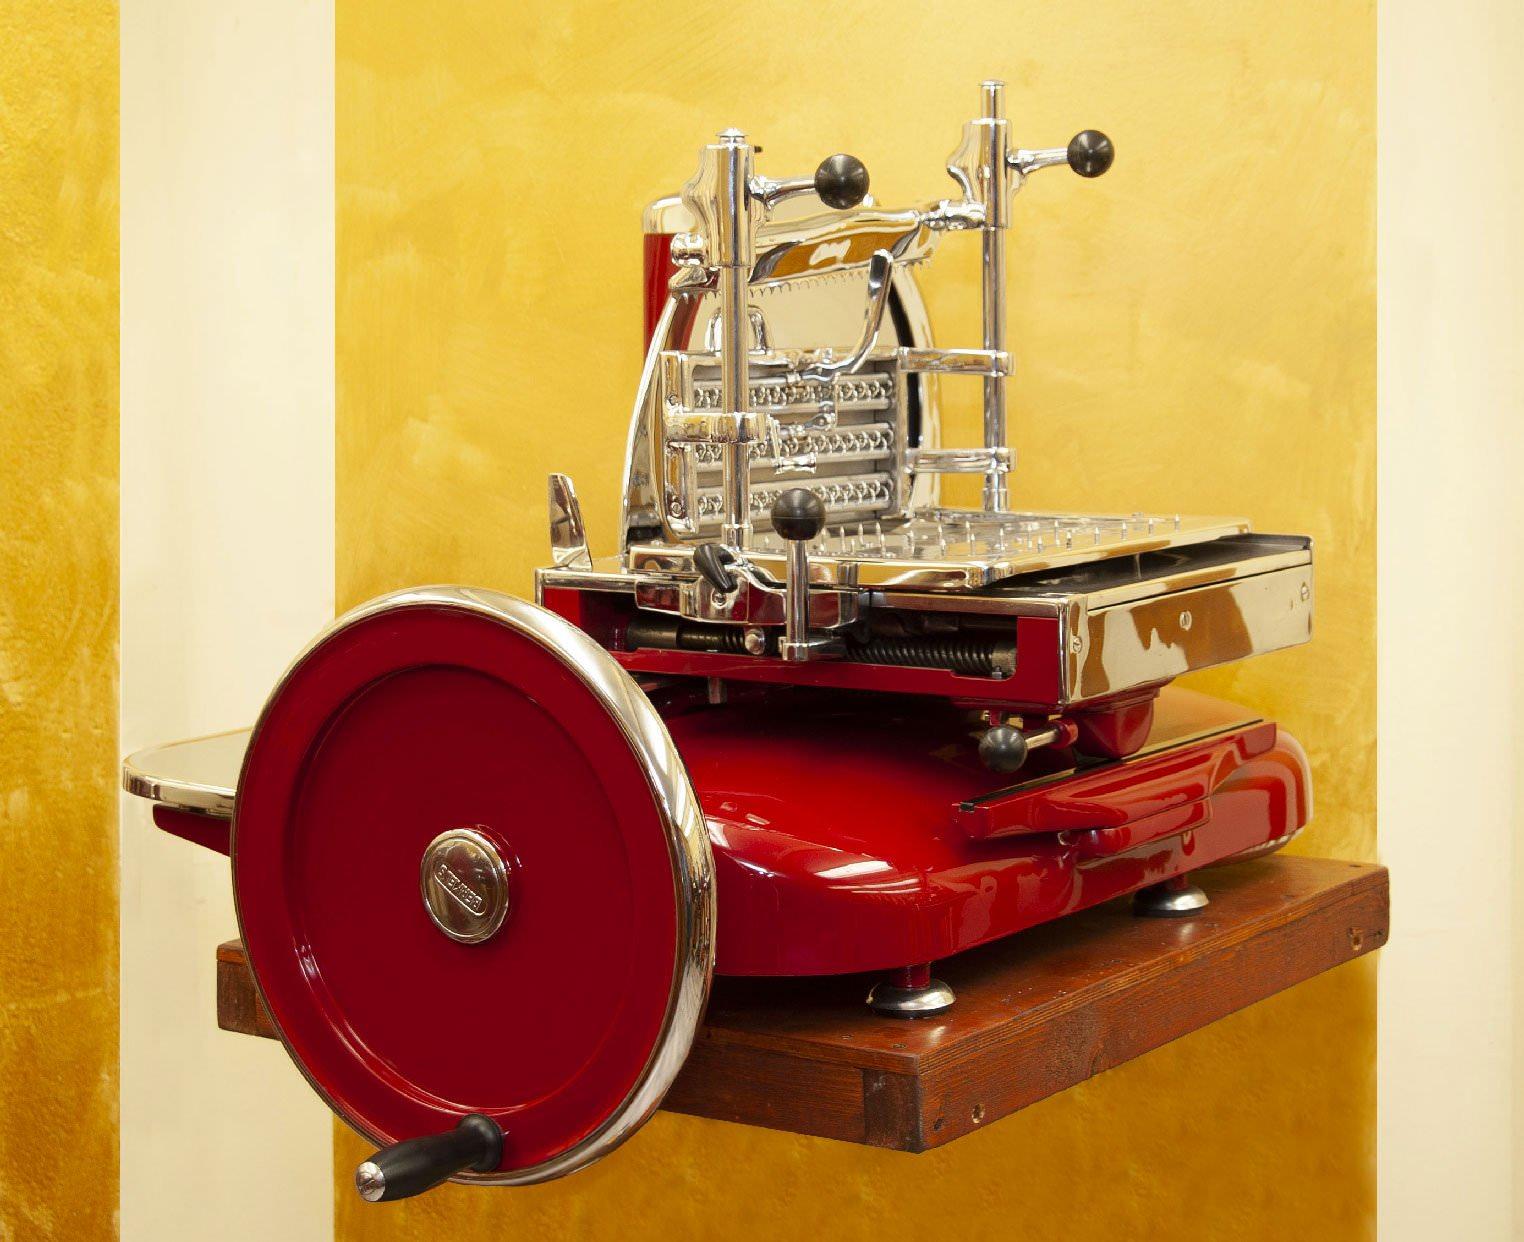 Berkel & Parnall's modello 32